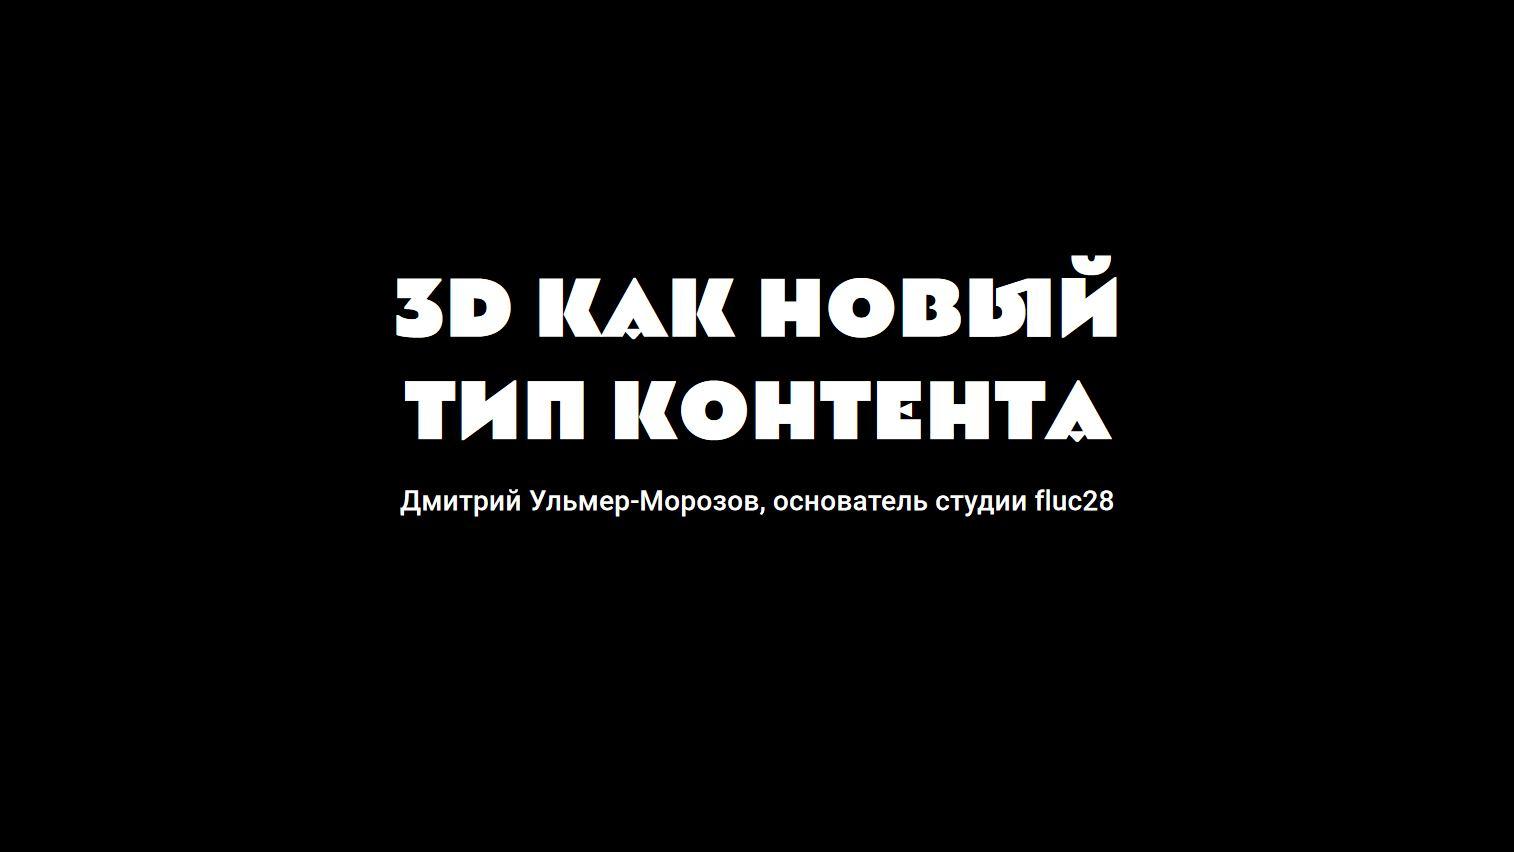 Дмитрий Ульмер-Морозов - WebGL - 01